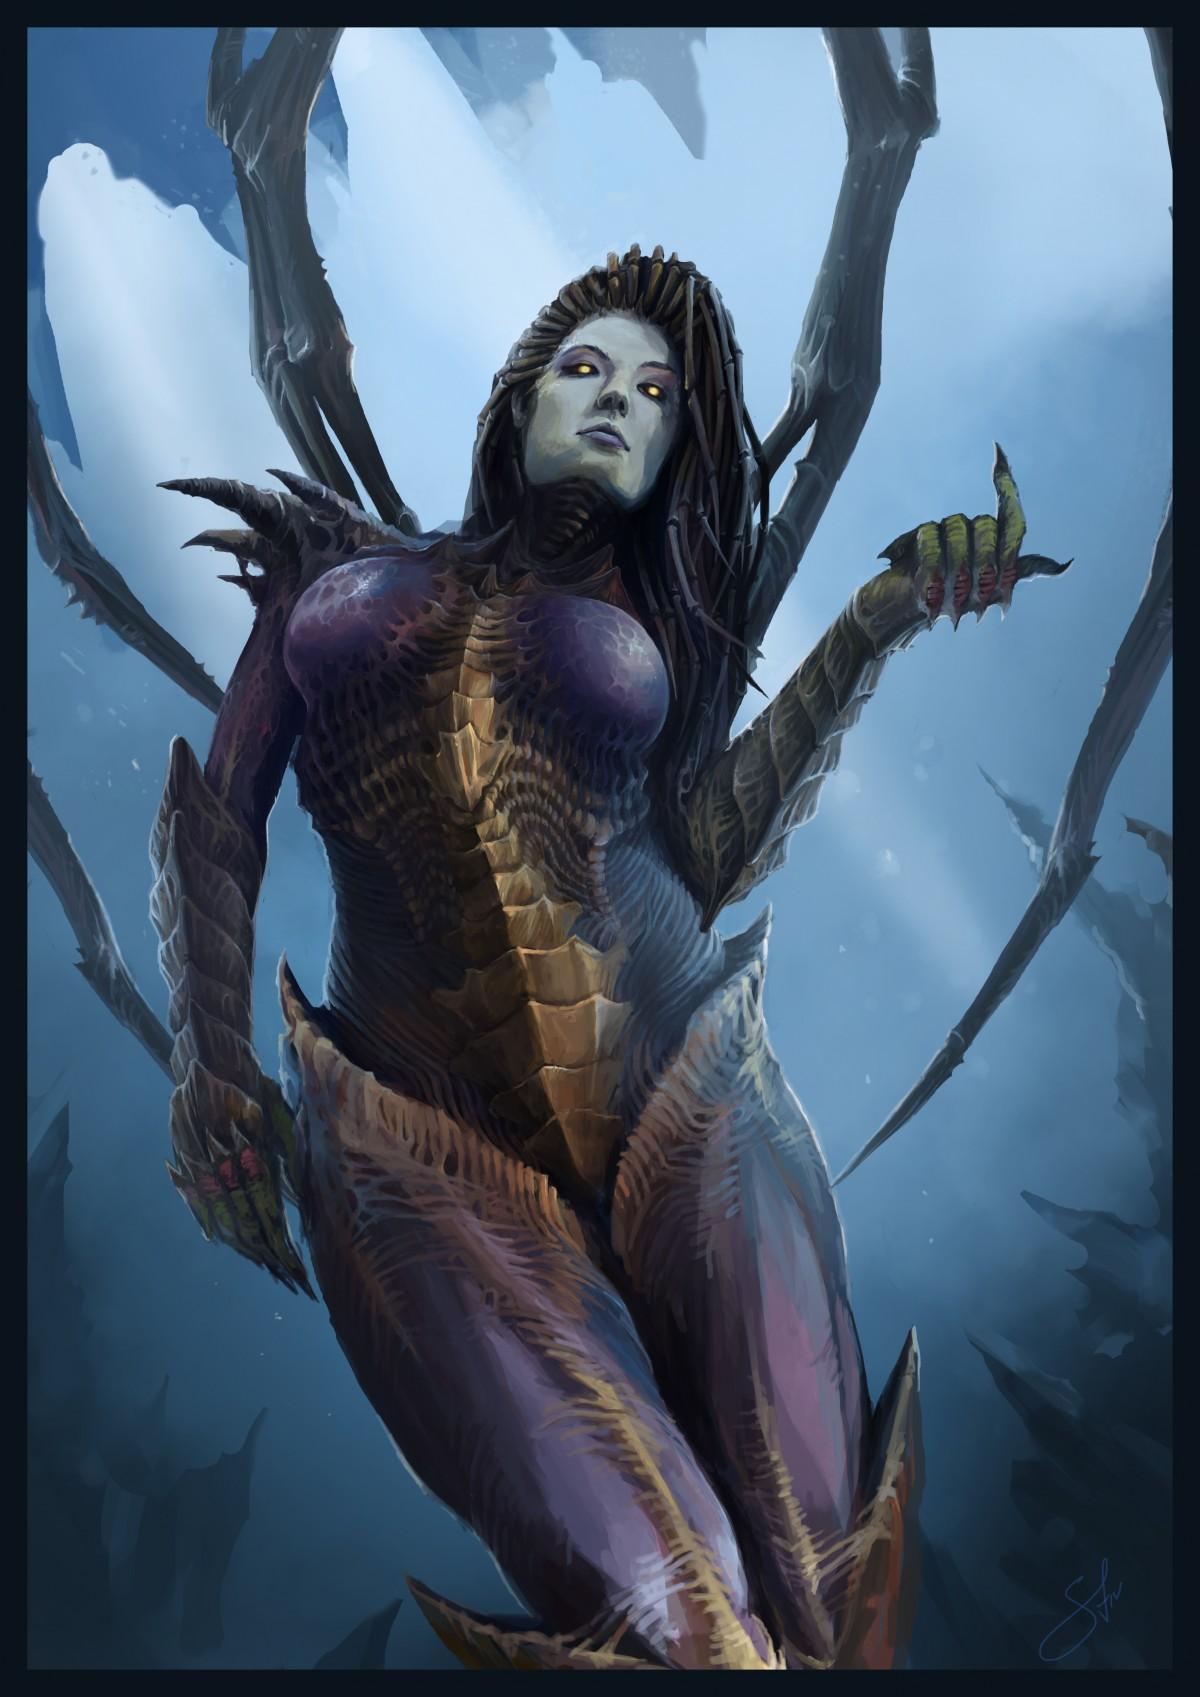 StarCraft 2 zerg concept art picture Керриган девушки из игр